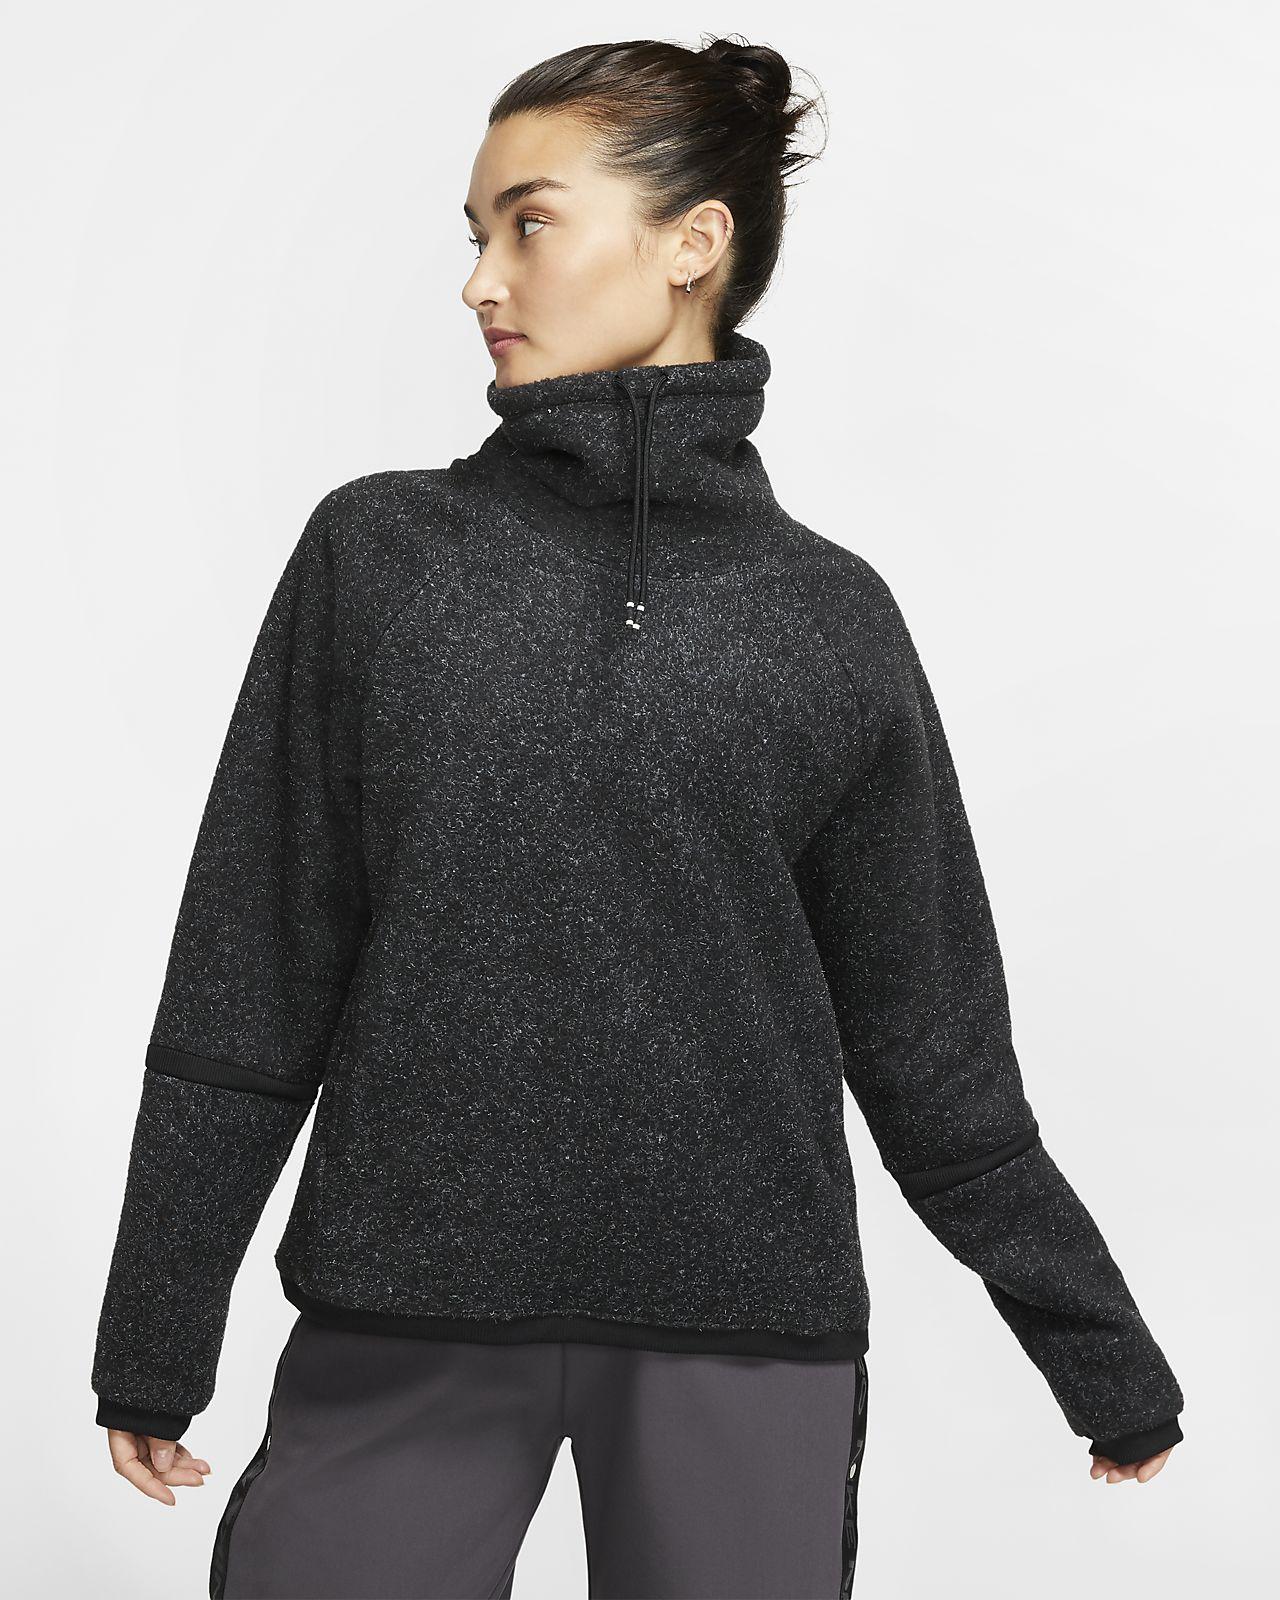 Nike Therma Women's Long Sleeve Fleece Training Top